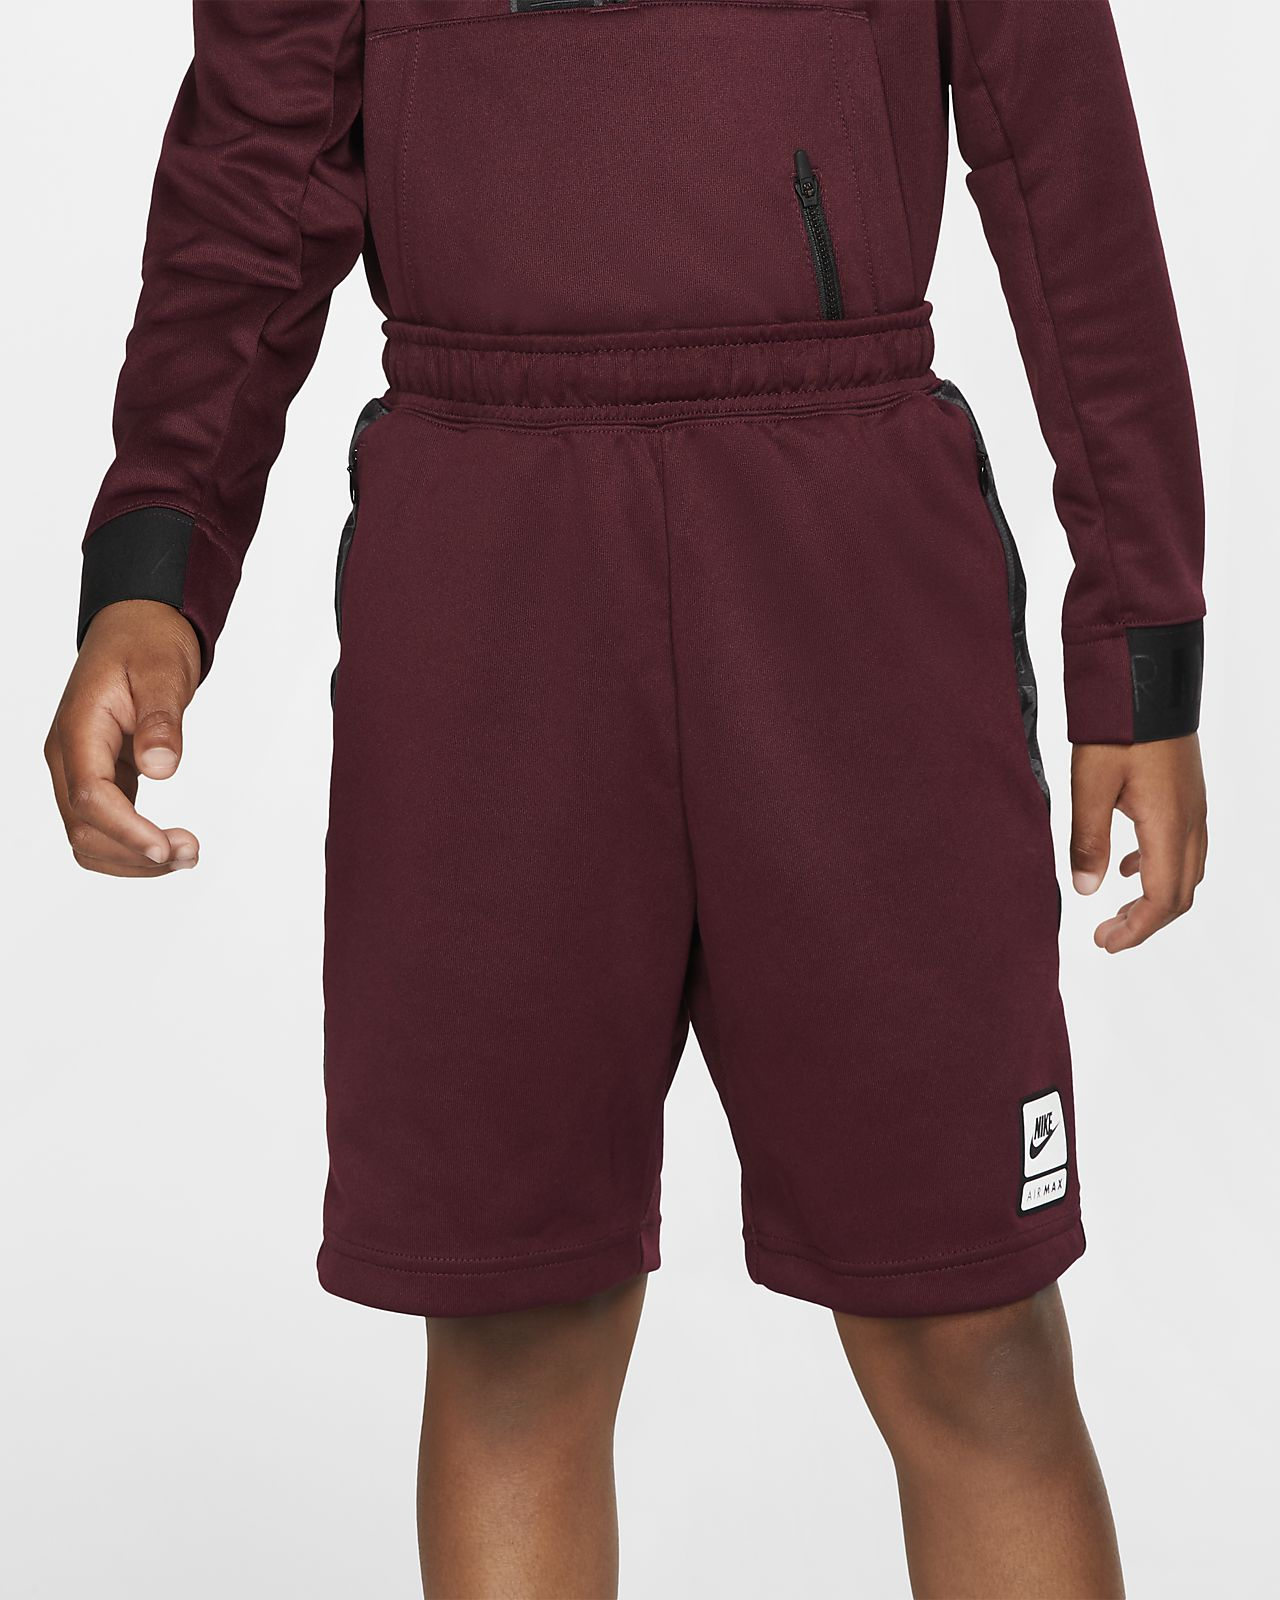 Nike Sportswear Air Max Older Kids' (Boys') Shorts